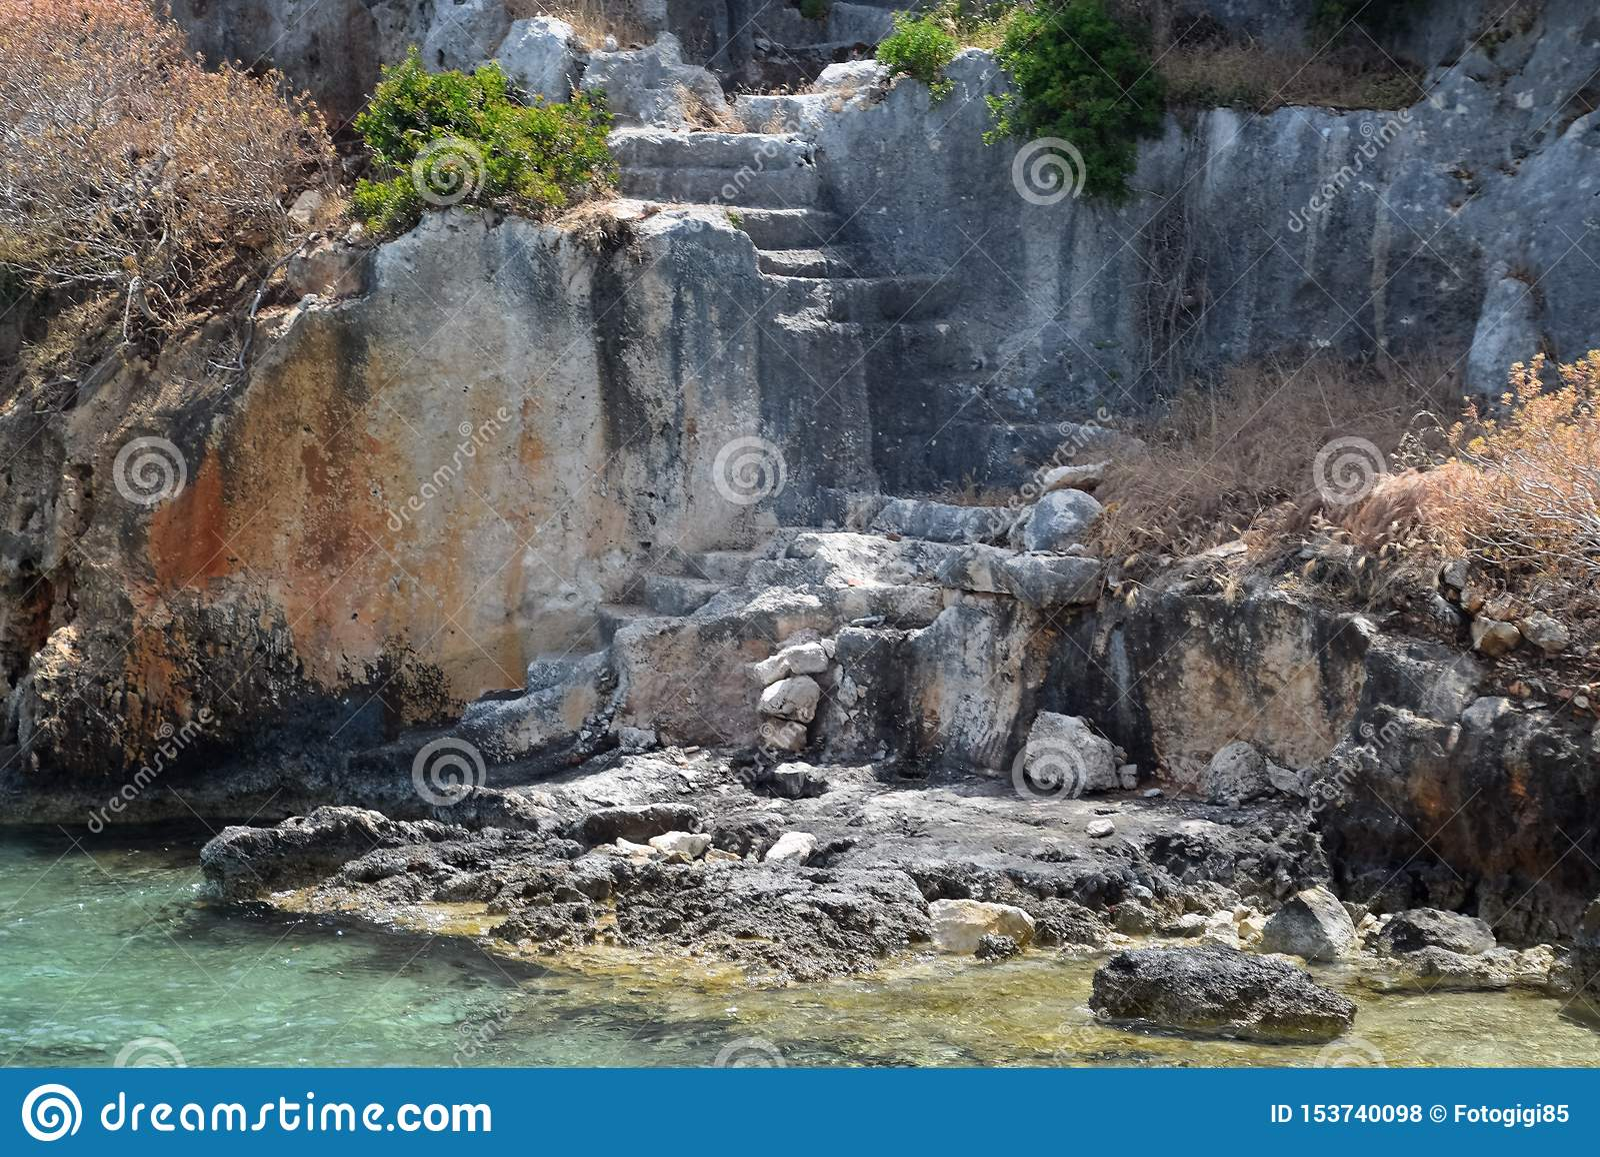 De ruïnes van de stad van Mira, Kekova